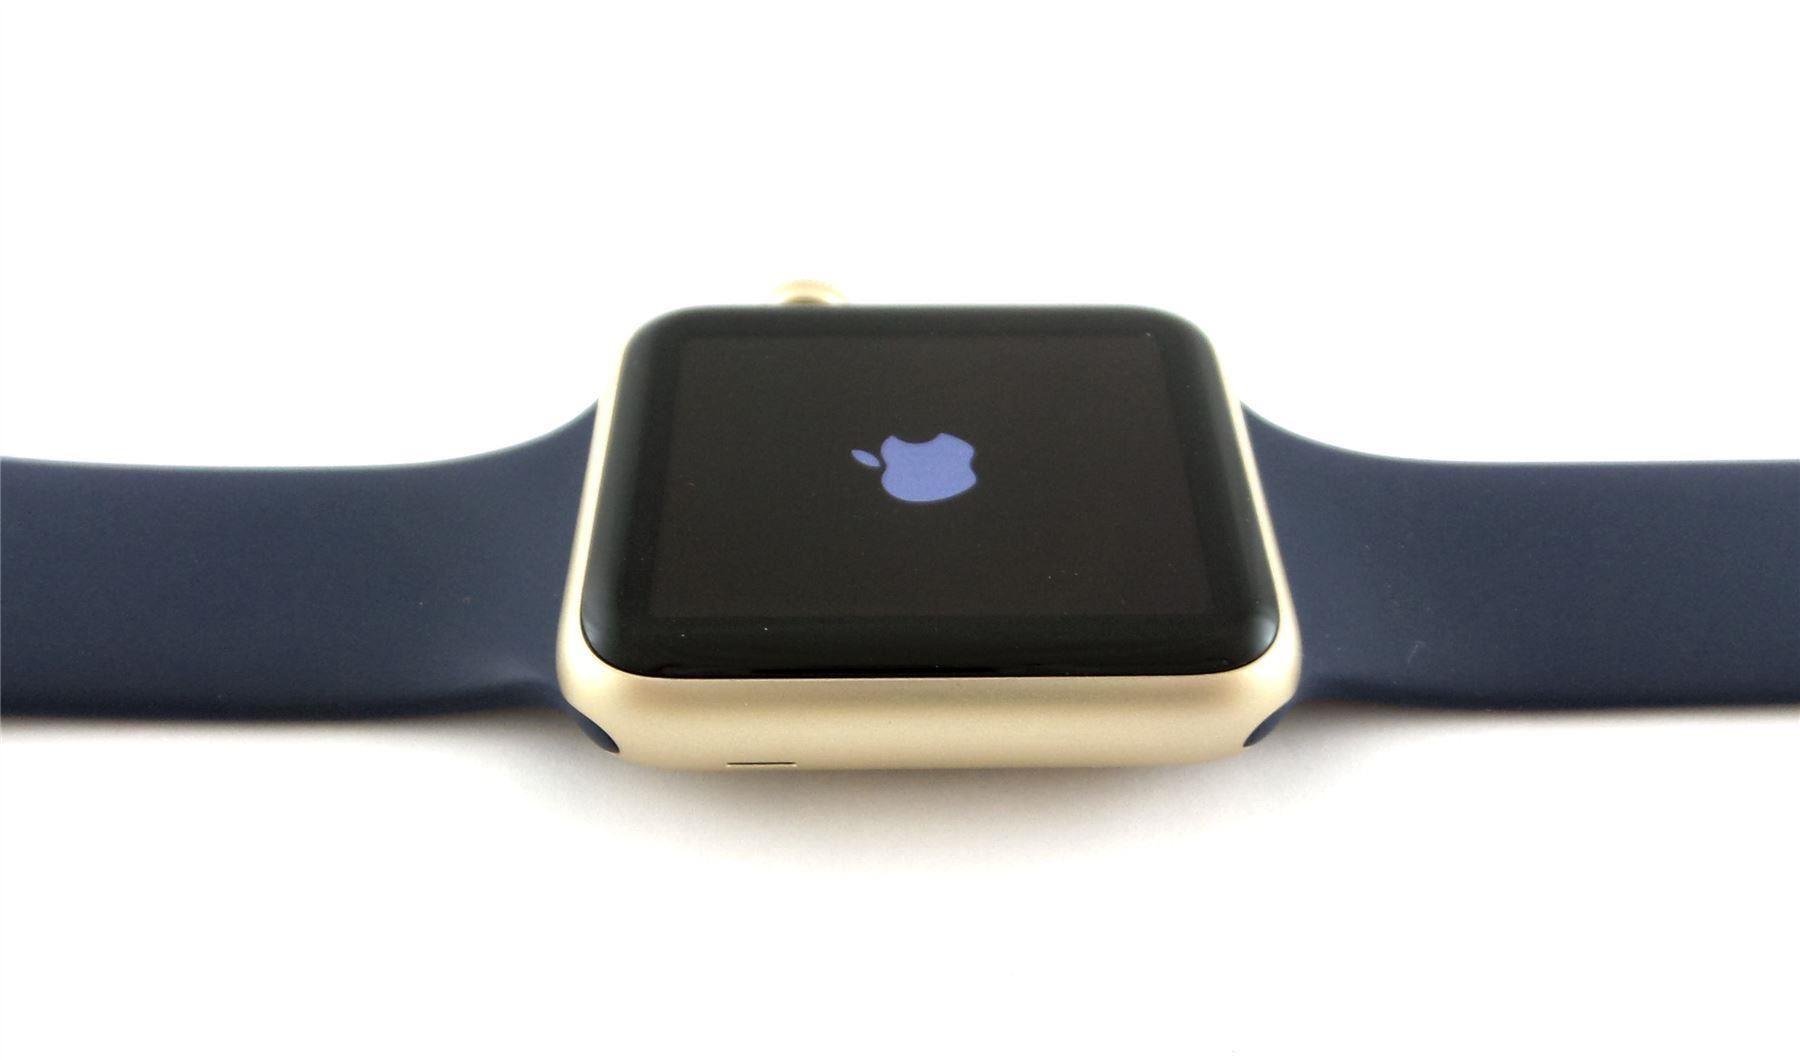 Apple Watch Sport Midnight Blue Gold Boston Enviro Film Festival 2014